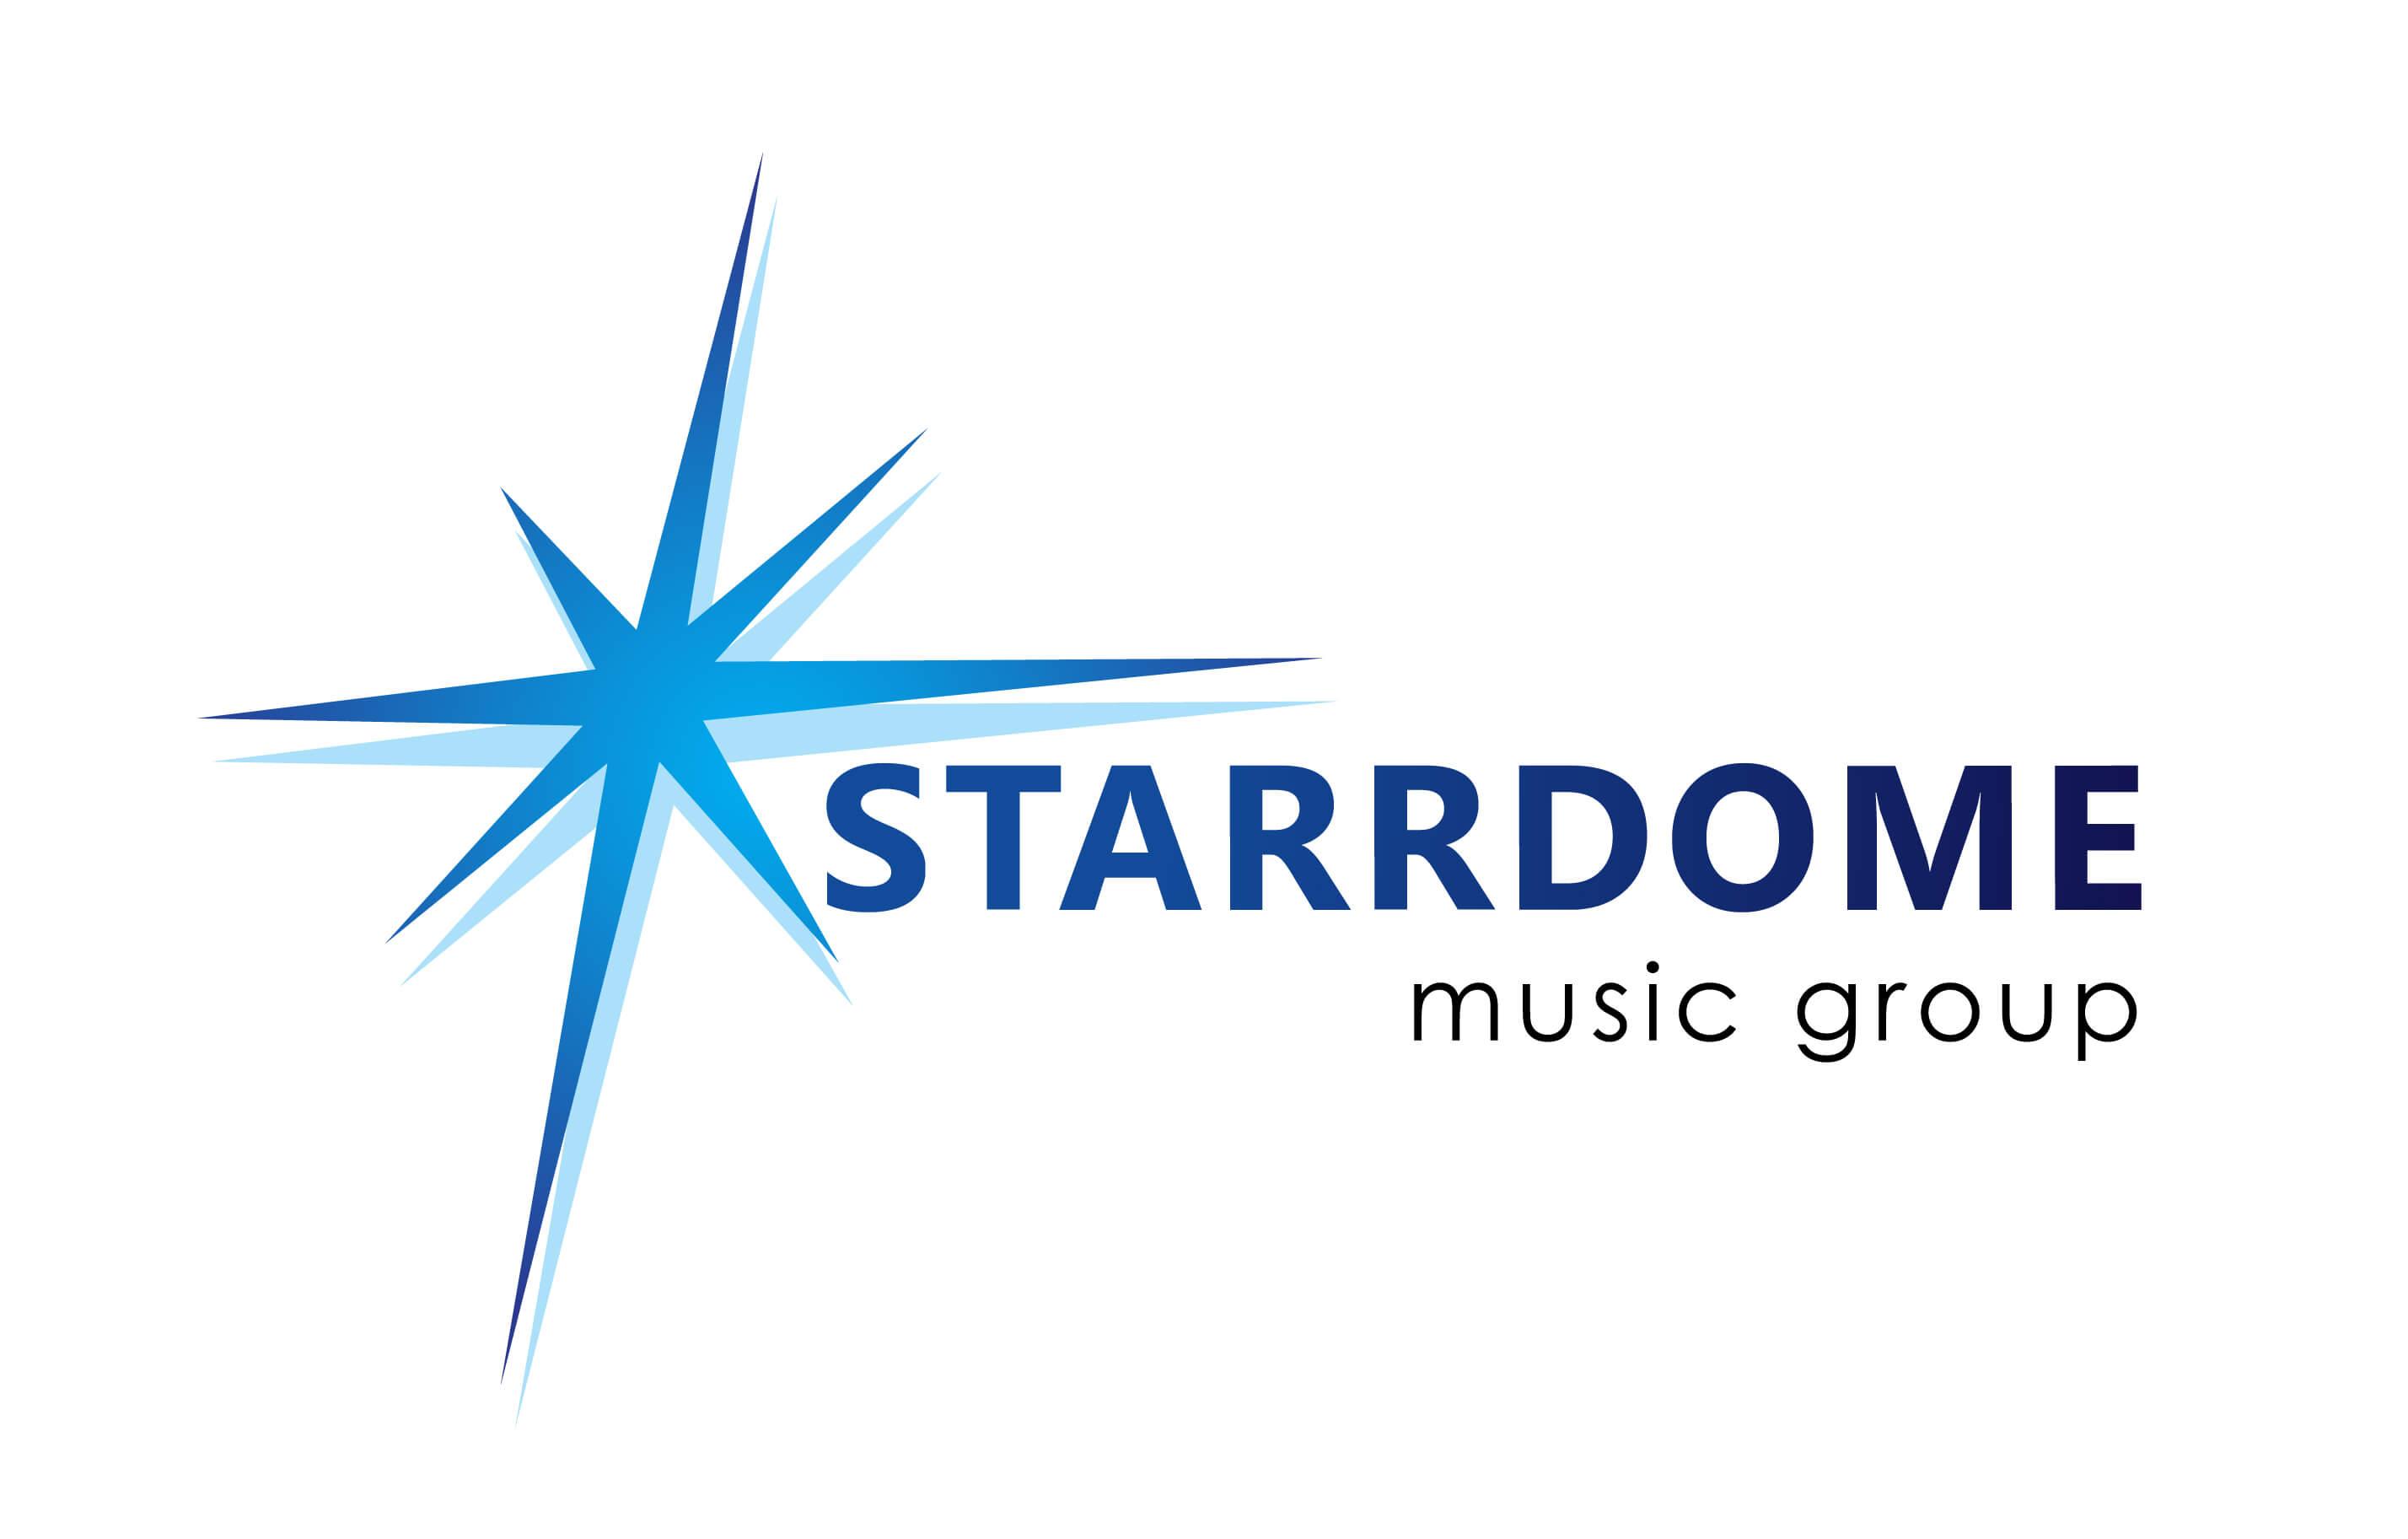 starrdome-music-group